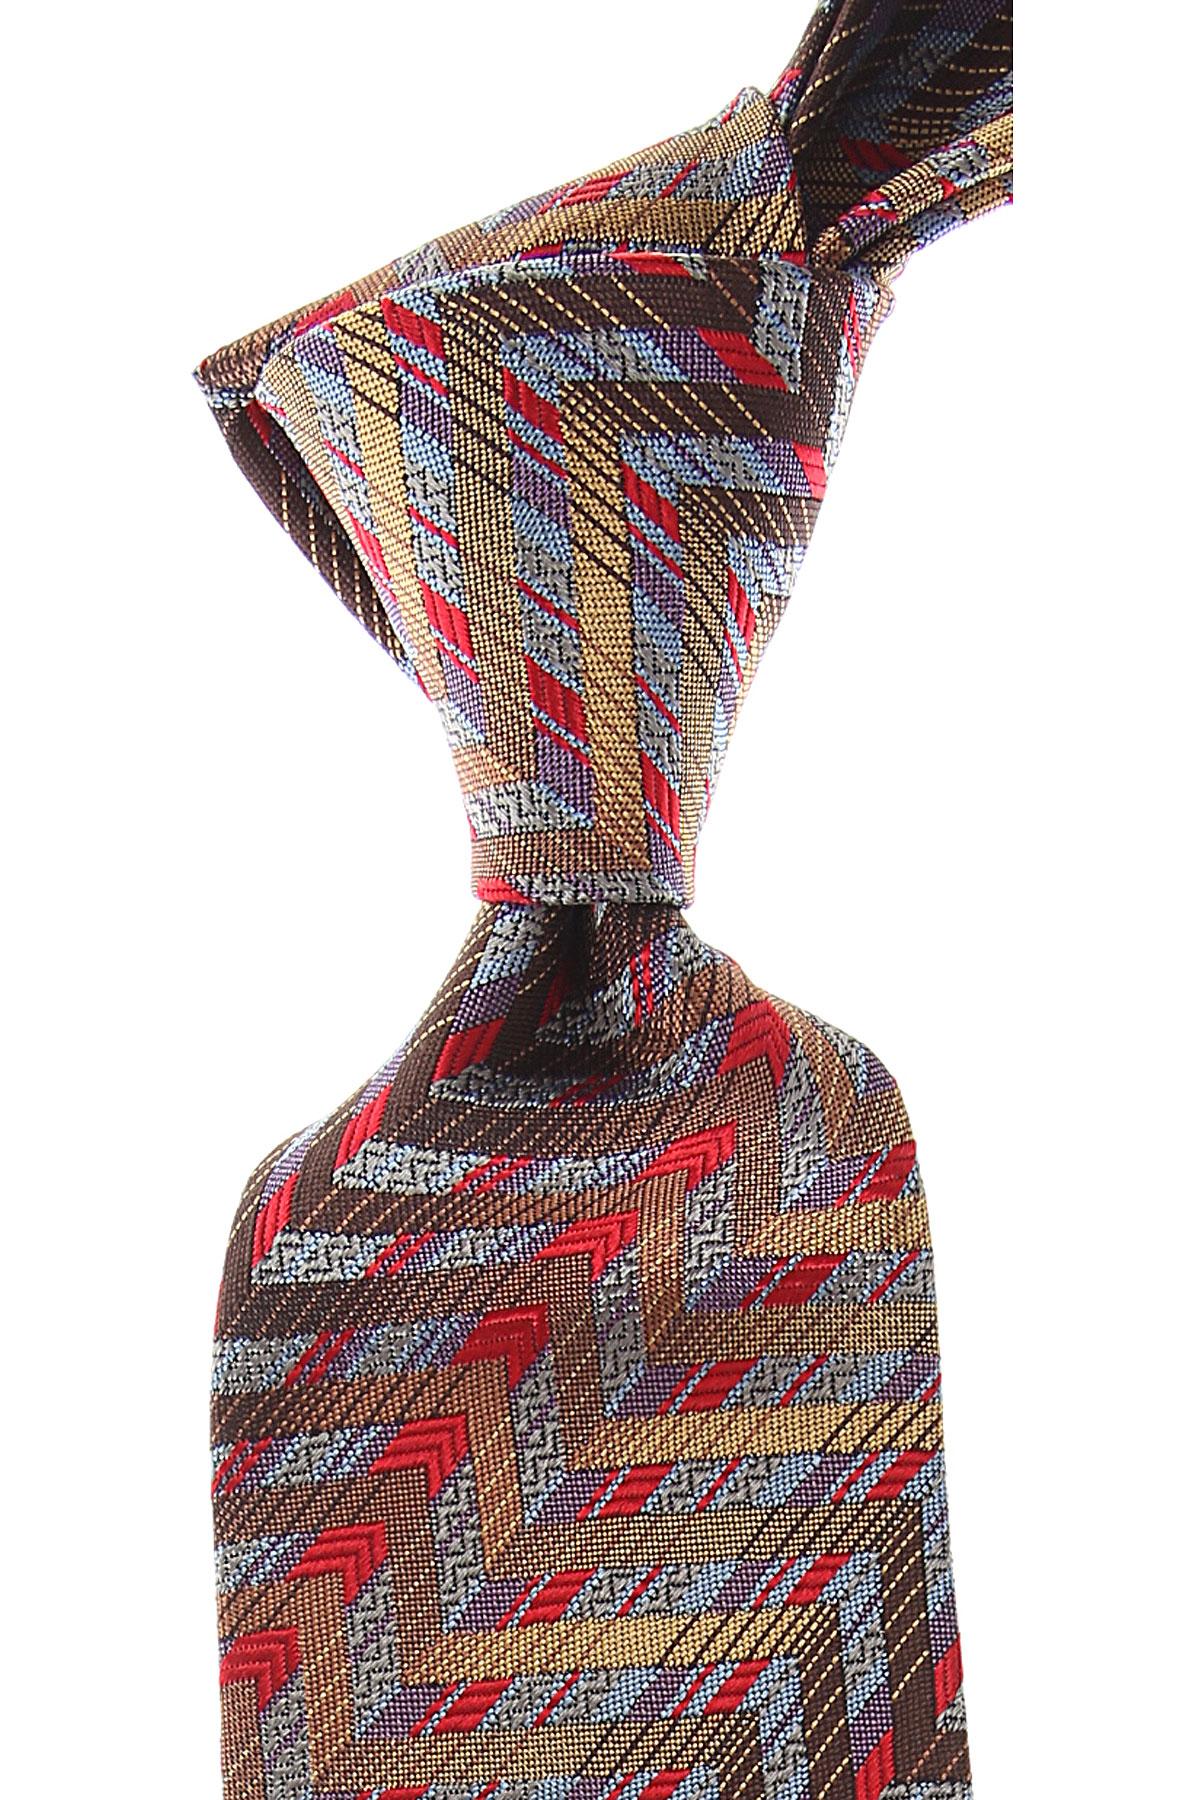 Missoni Ties On Sale, Antique Bronze, Silk, 2019